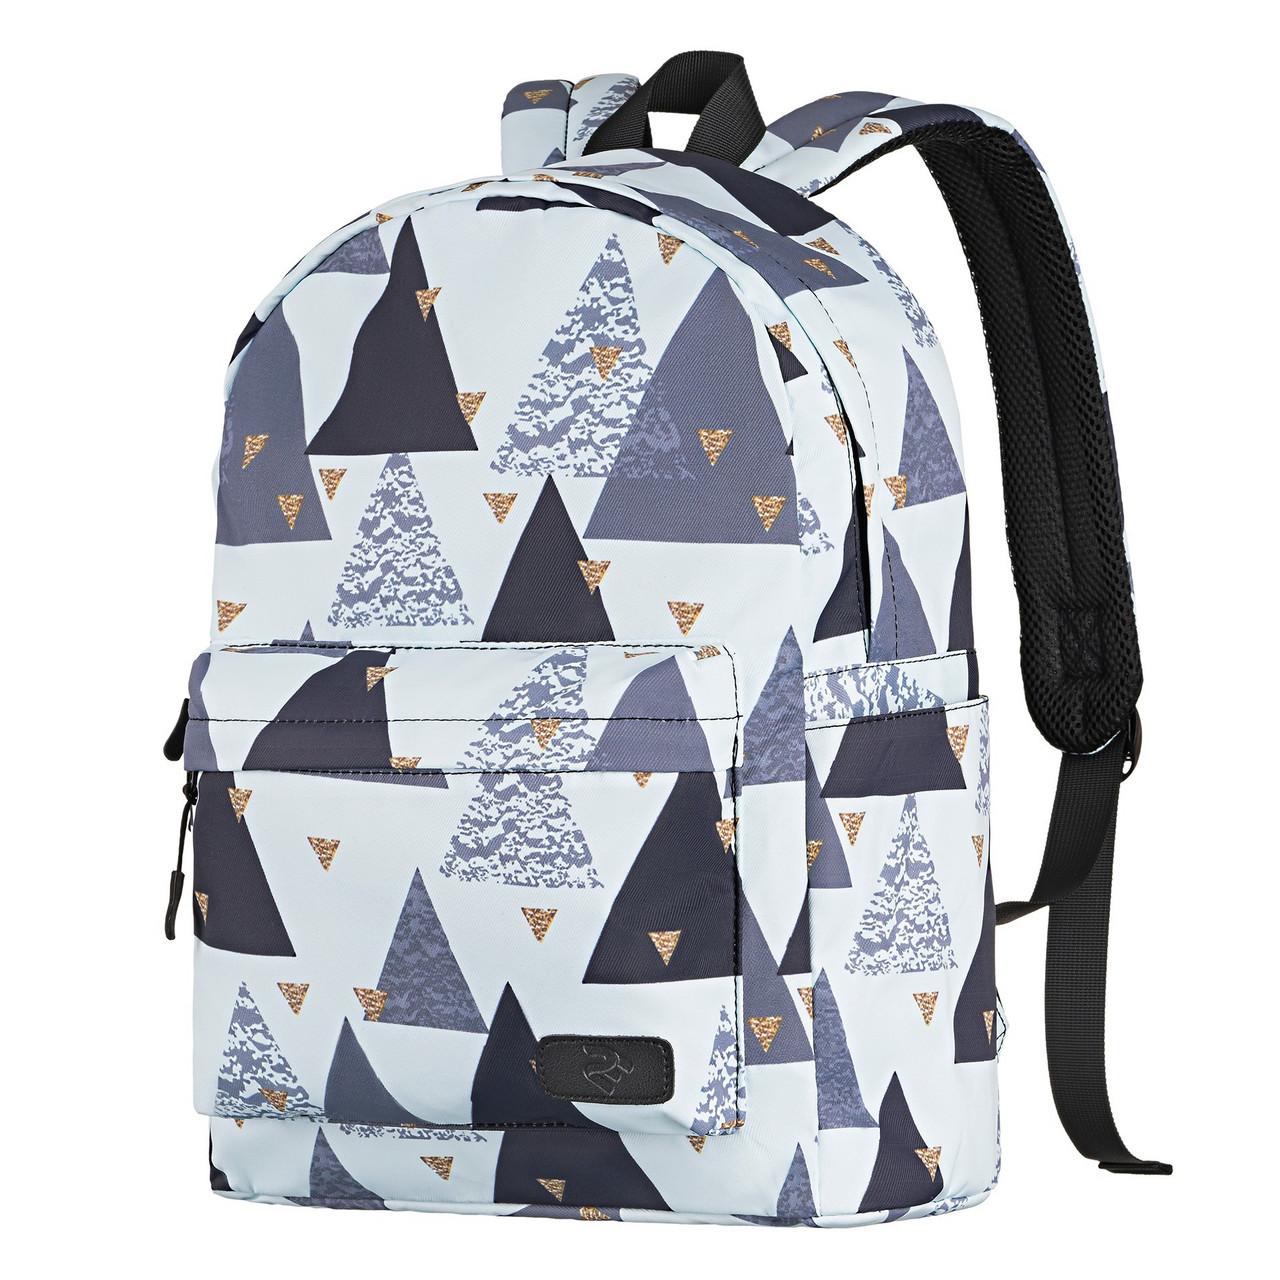 Рюкзак TeensPack белый с рисунком Triangles, «2E Bags&Cases» (2E-BPT6114WT)